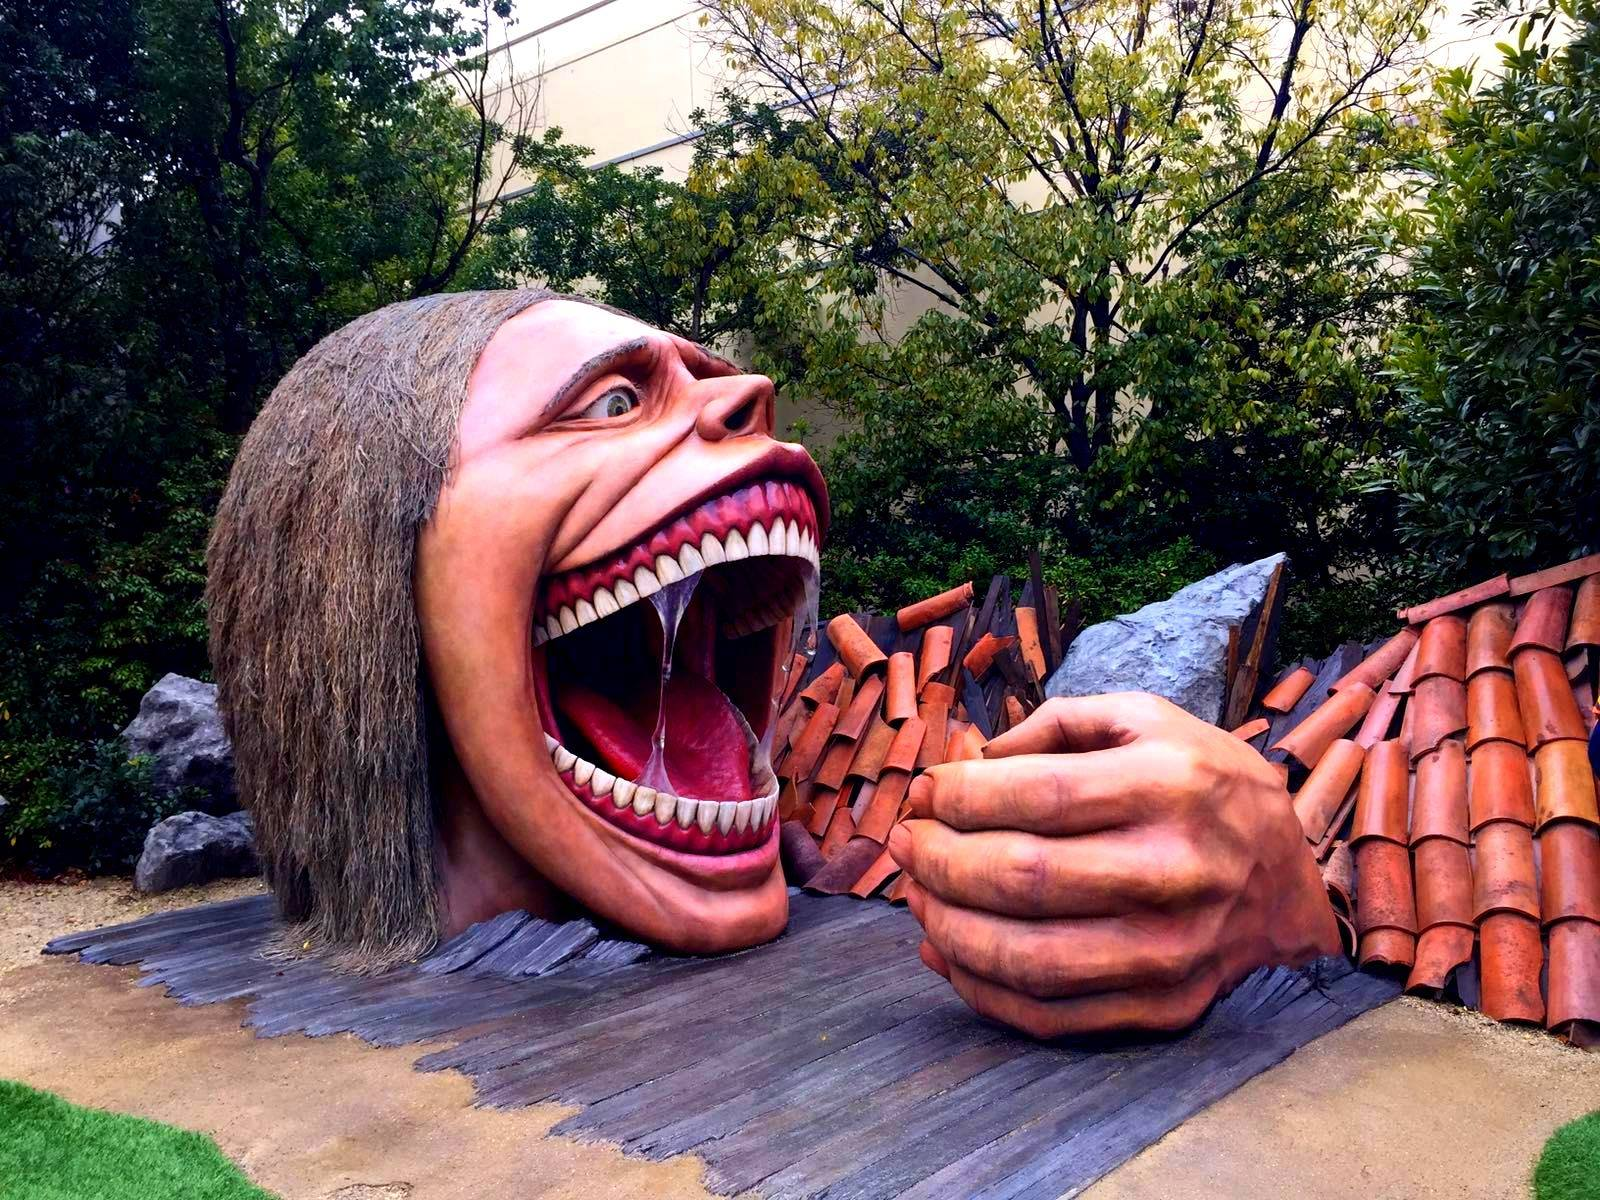 osaka parco attacco dei giganti